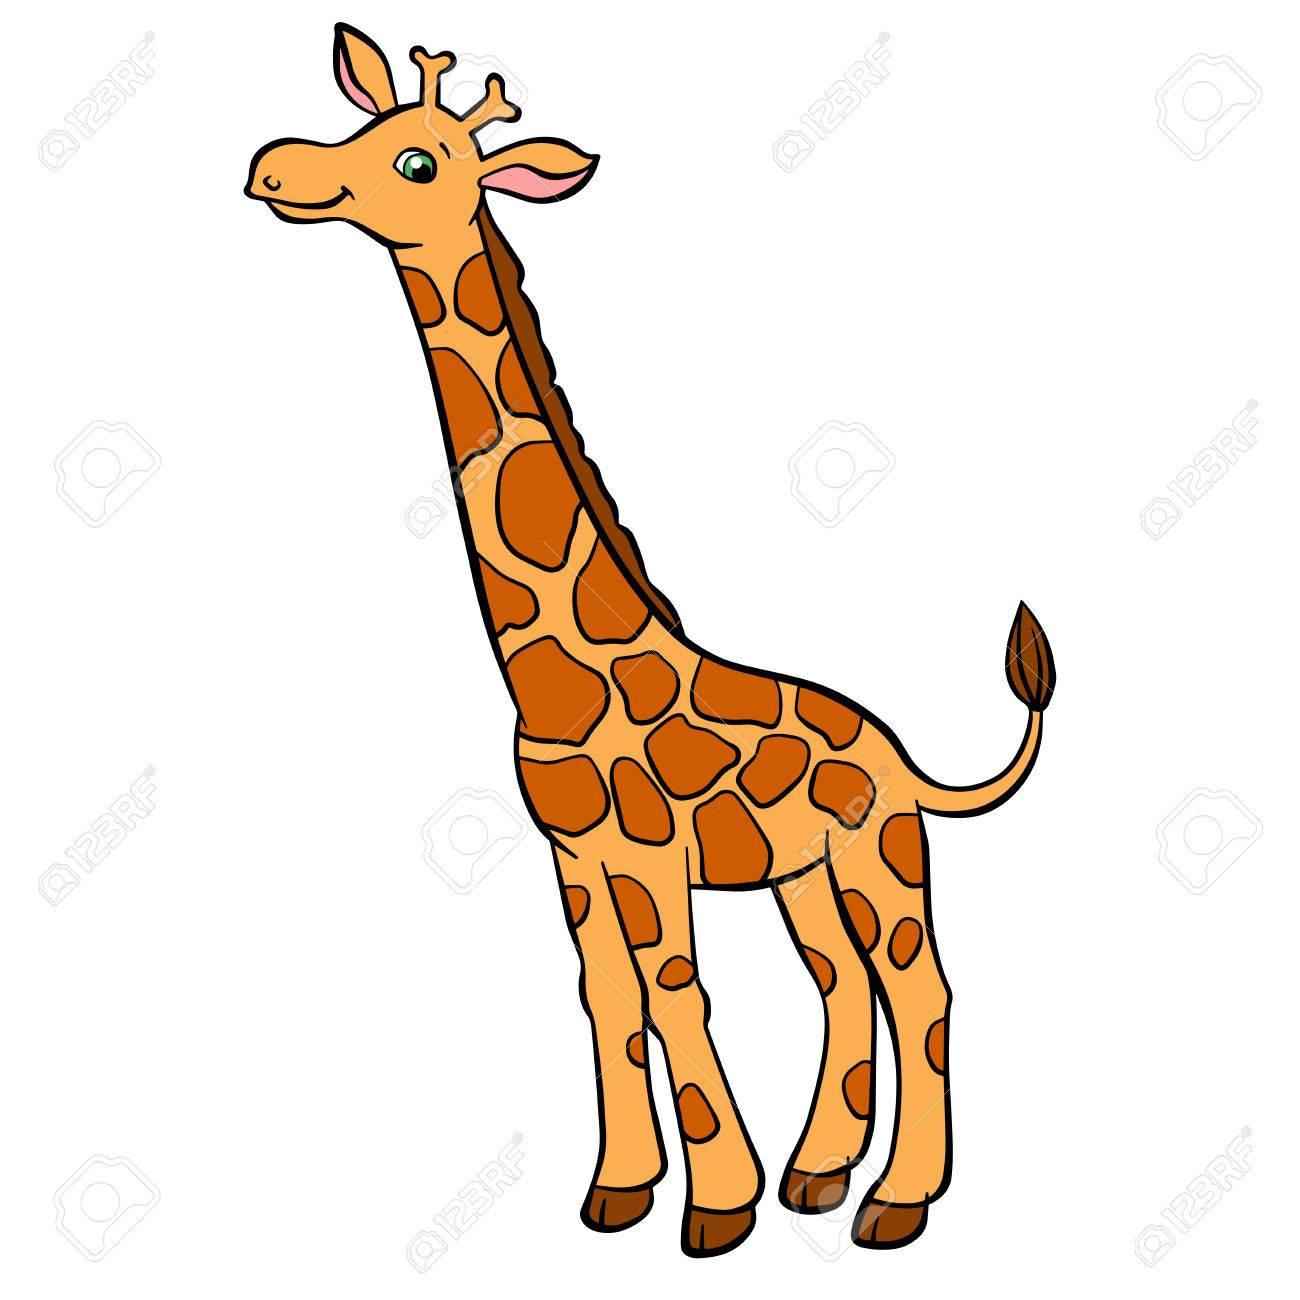 1300x1300 Fortune Giraffe Pictures For Kids Cartoon Wild Animals Little Cute